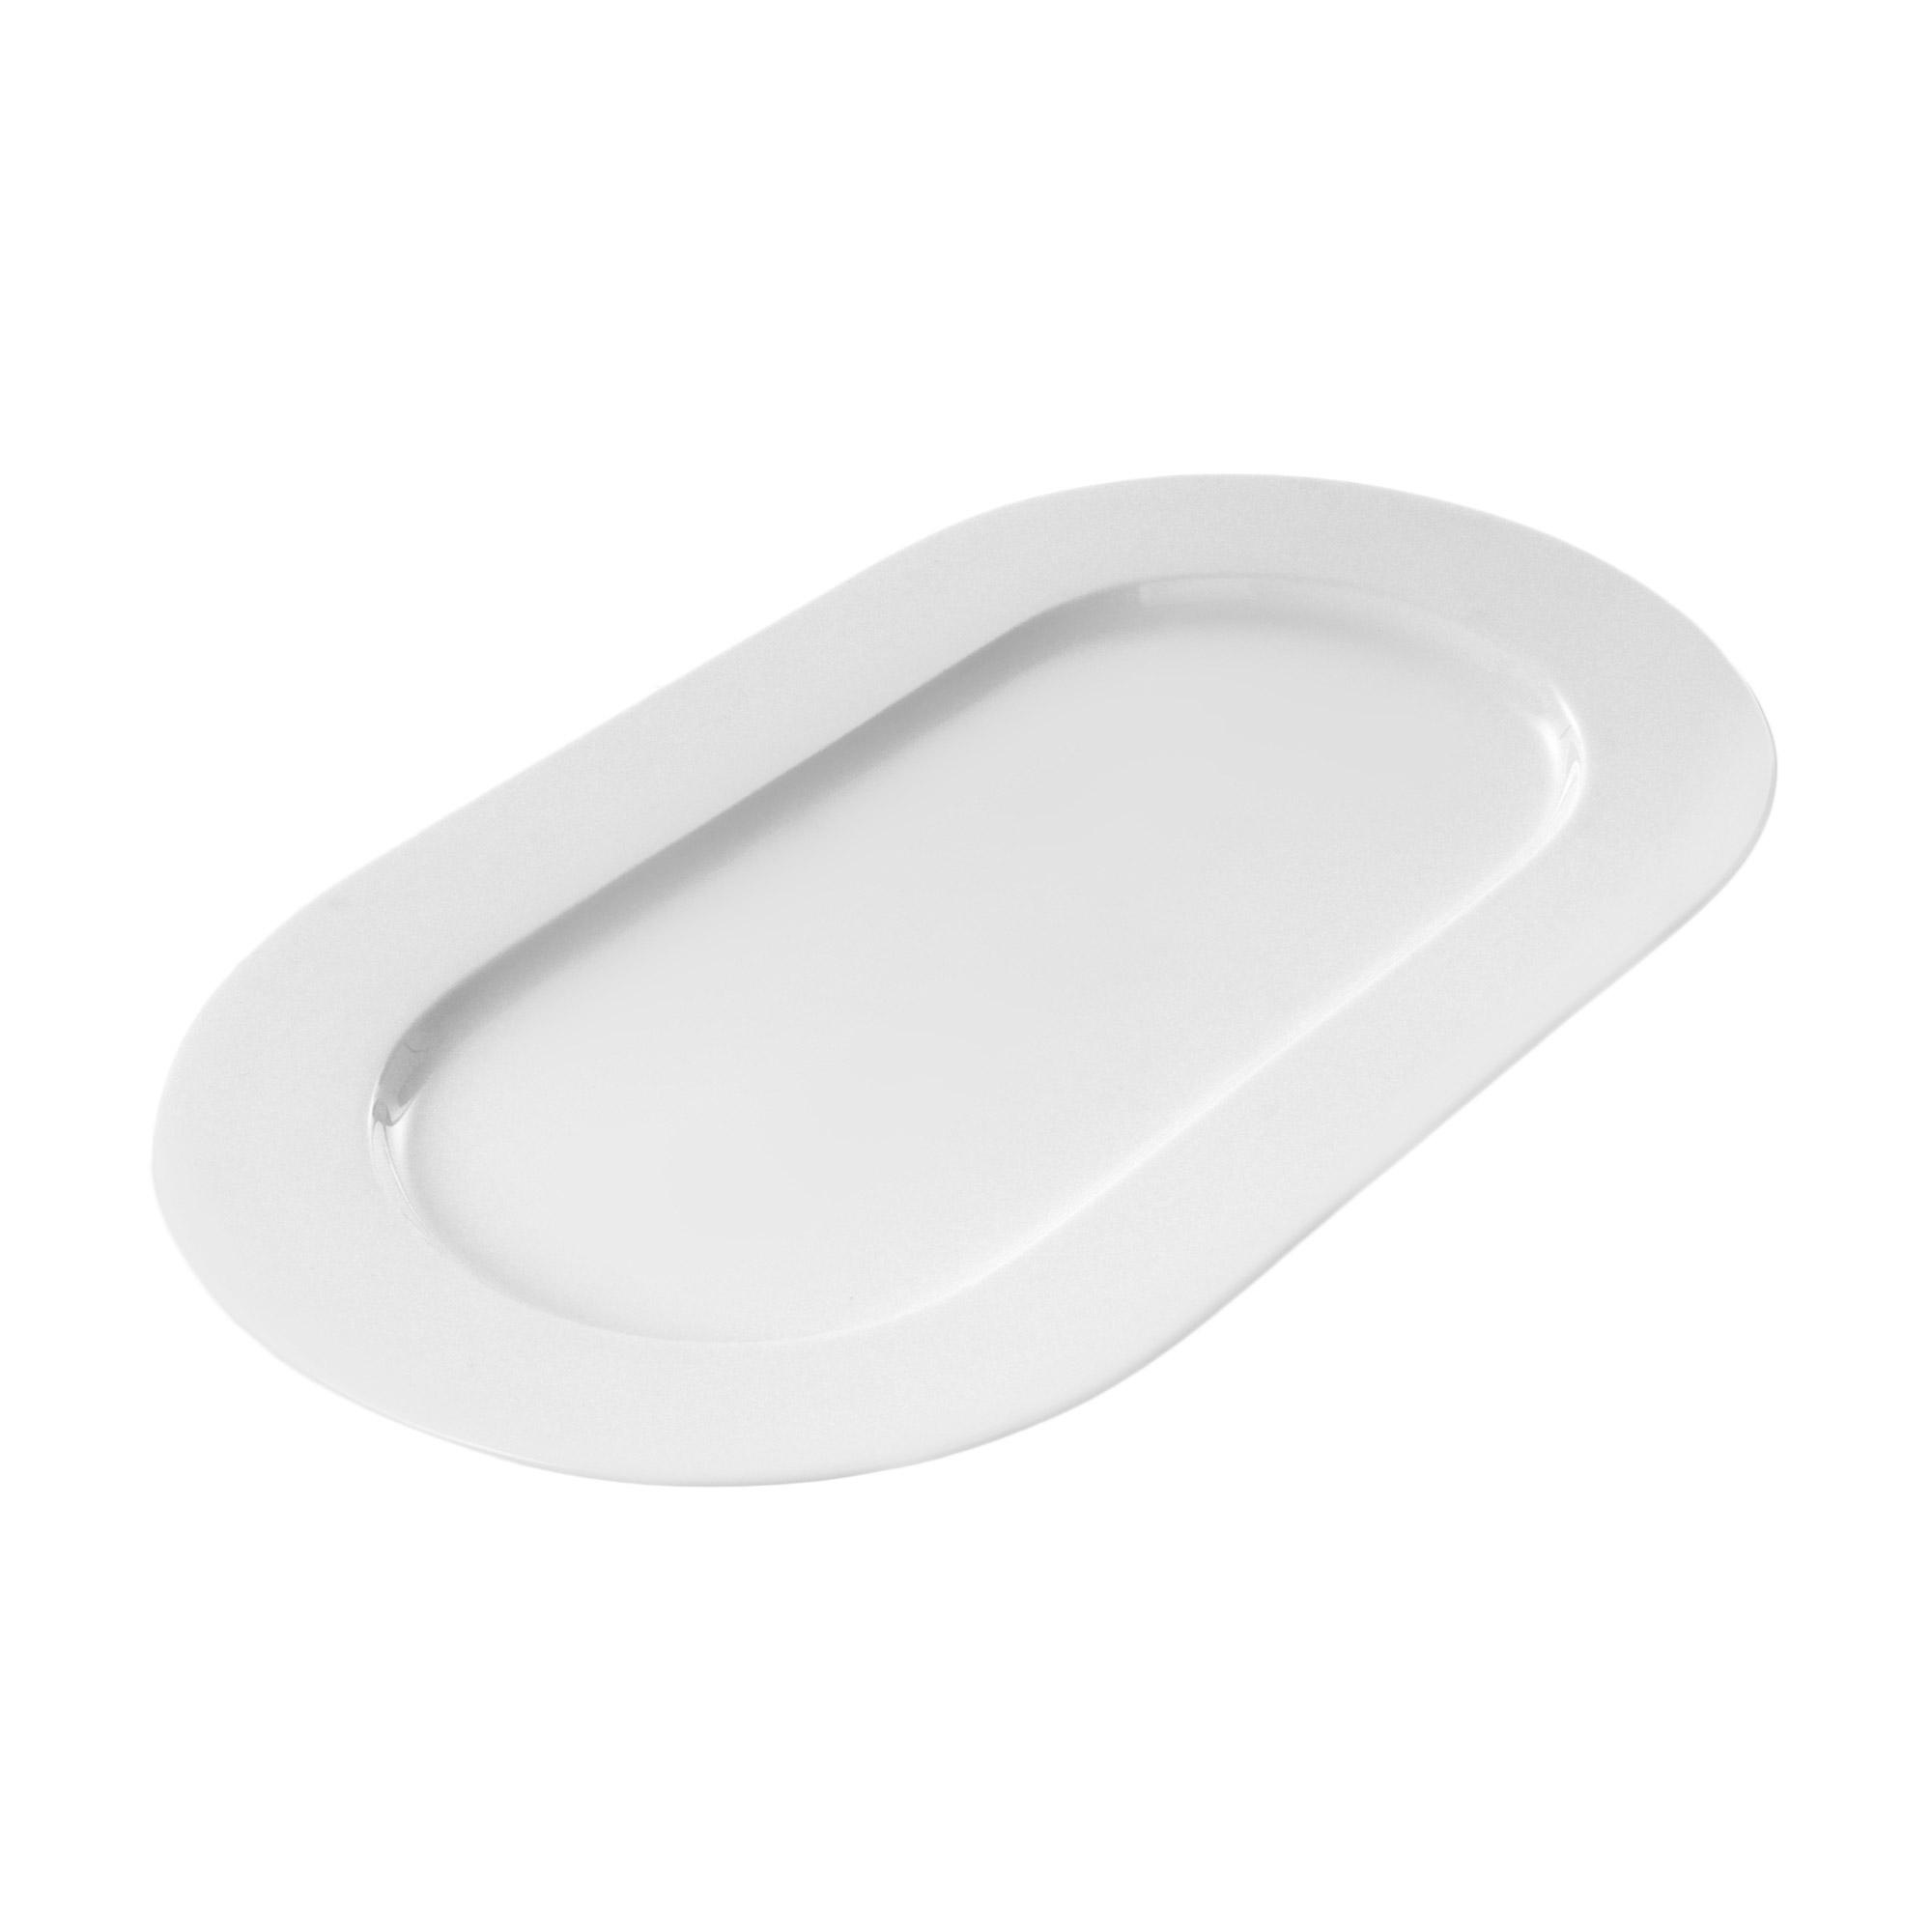 Купить Тарелка Monno Акцент 39х22 см, белый, костяной фарфор